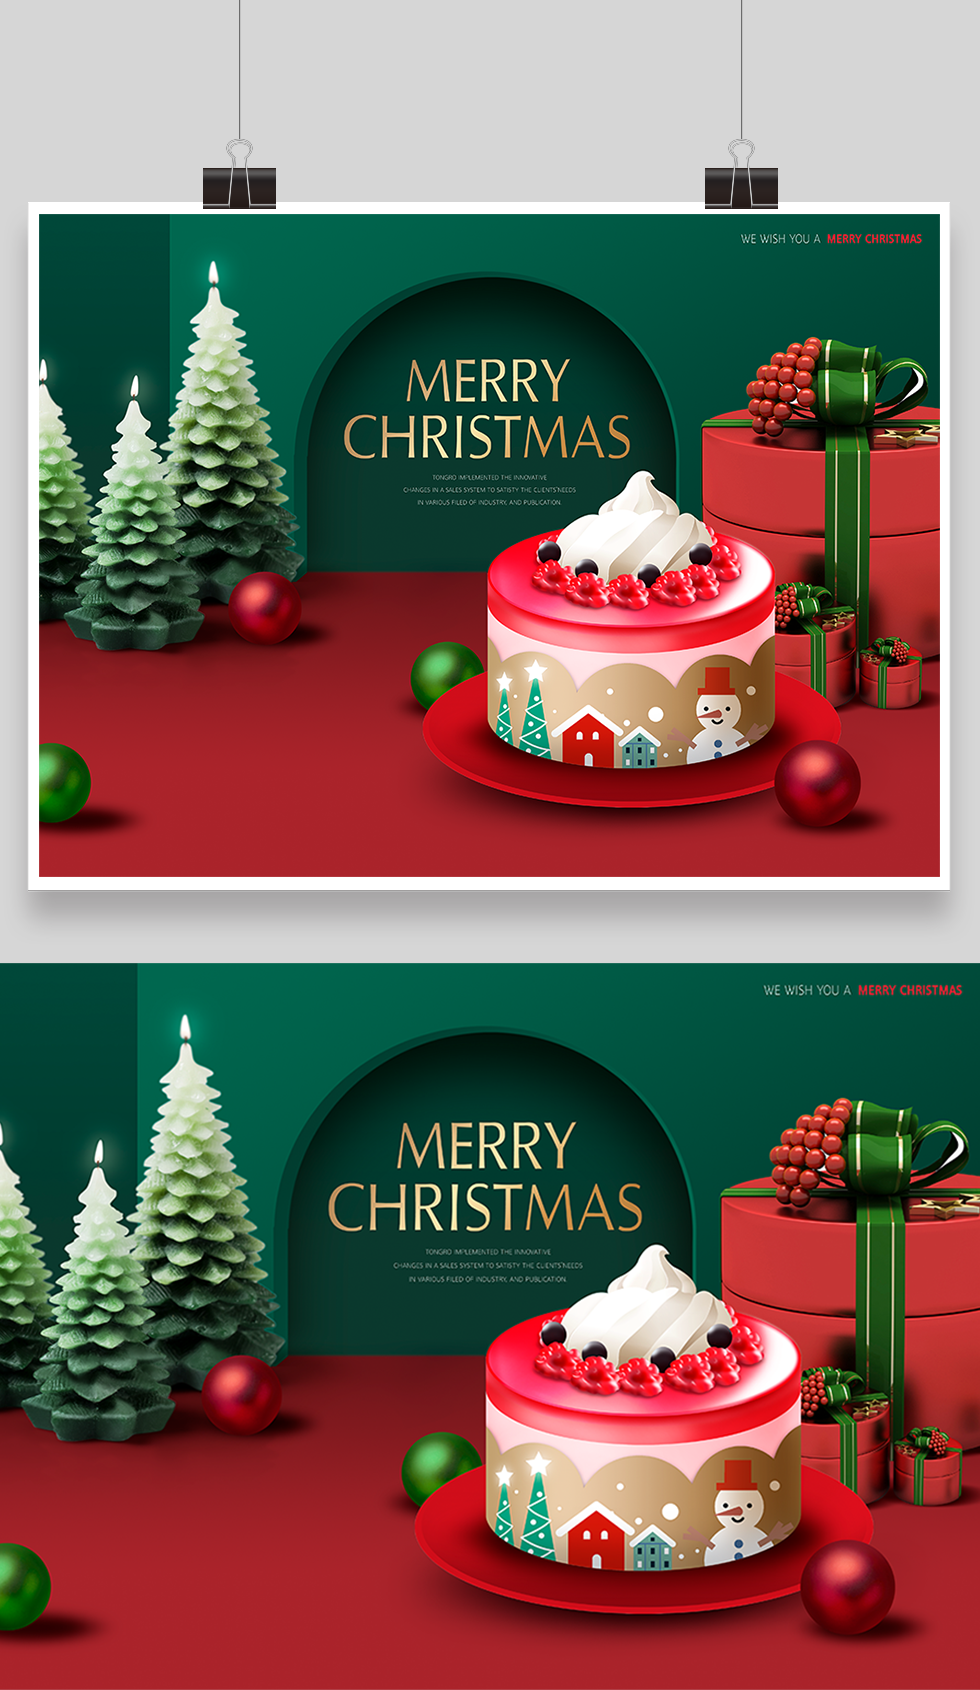 C4D风格立体创意圣诞节海报Christmas素材